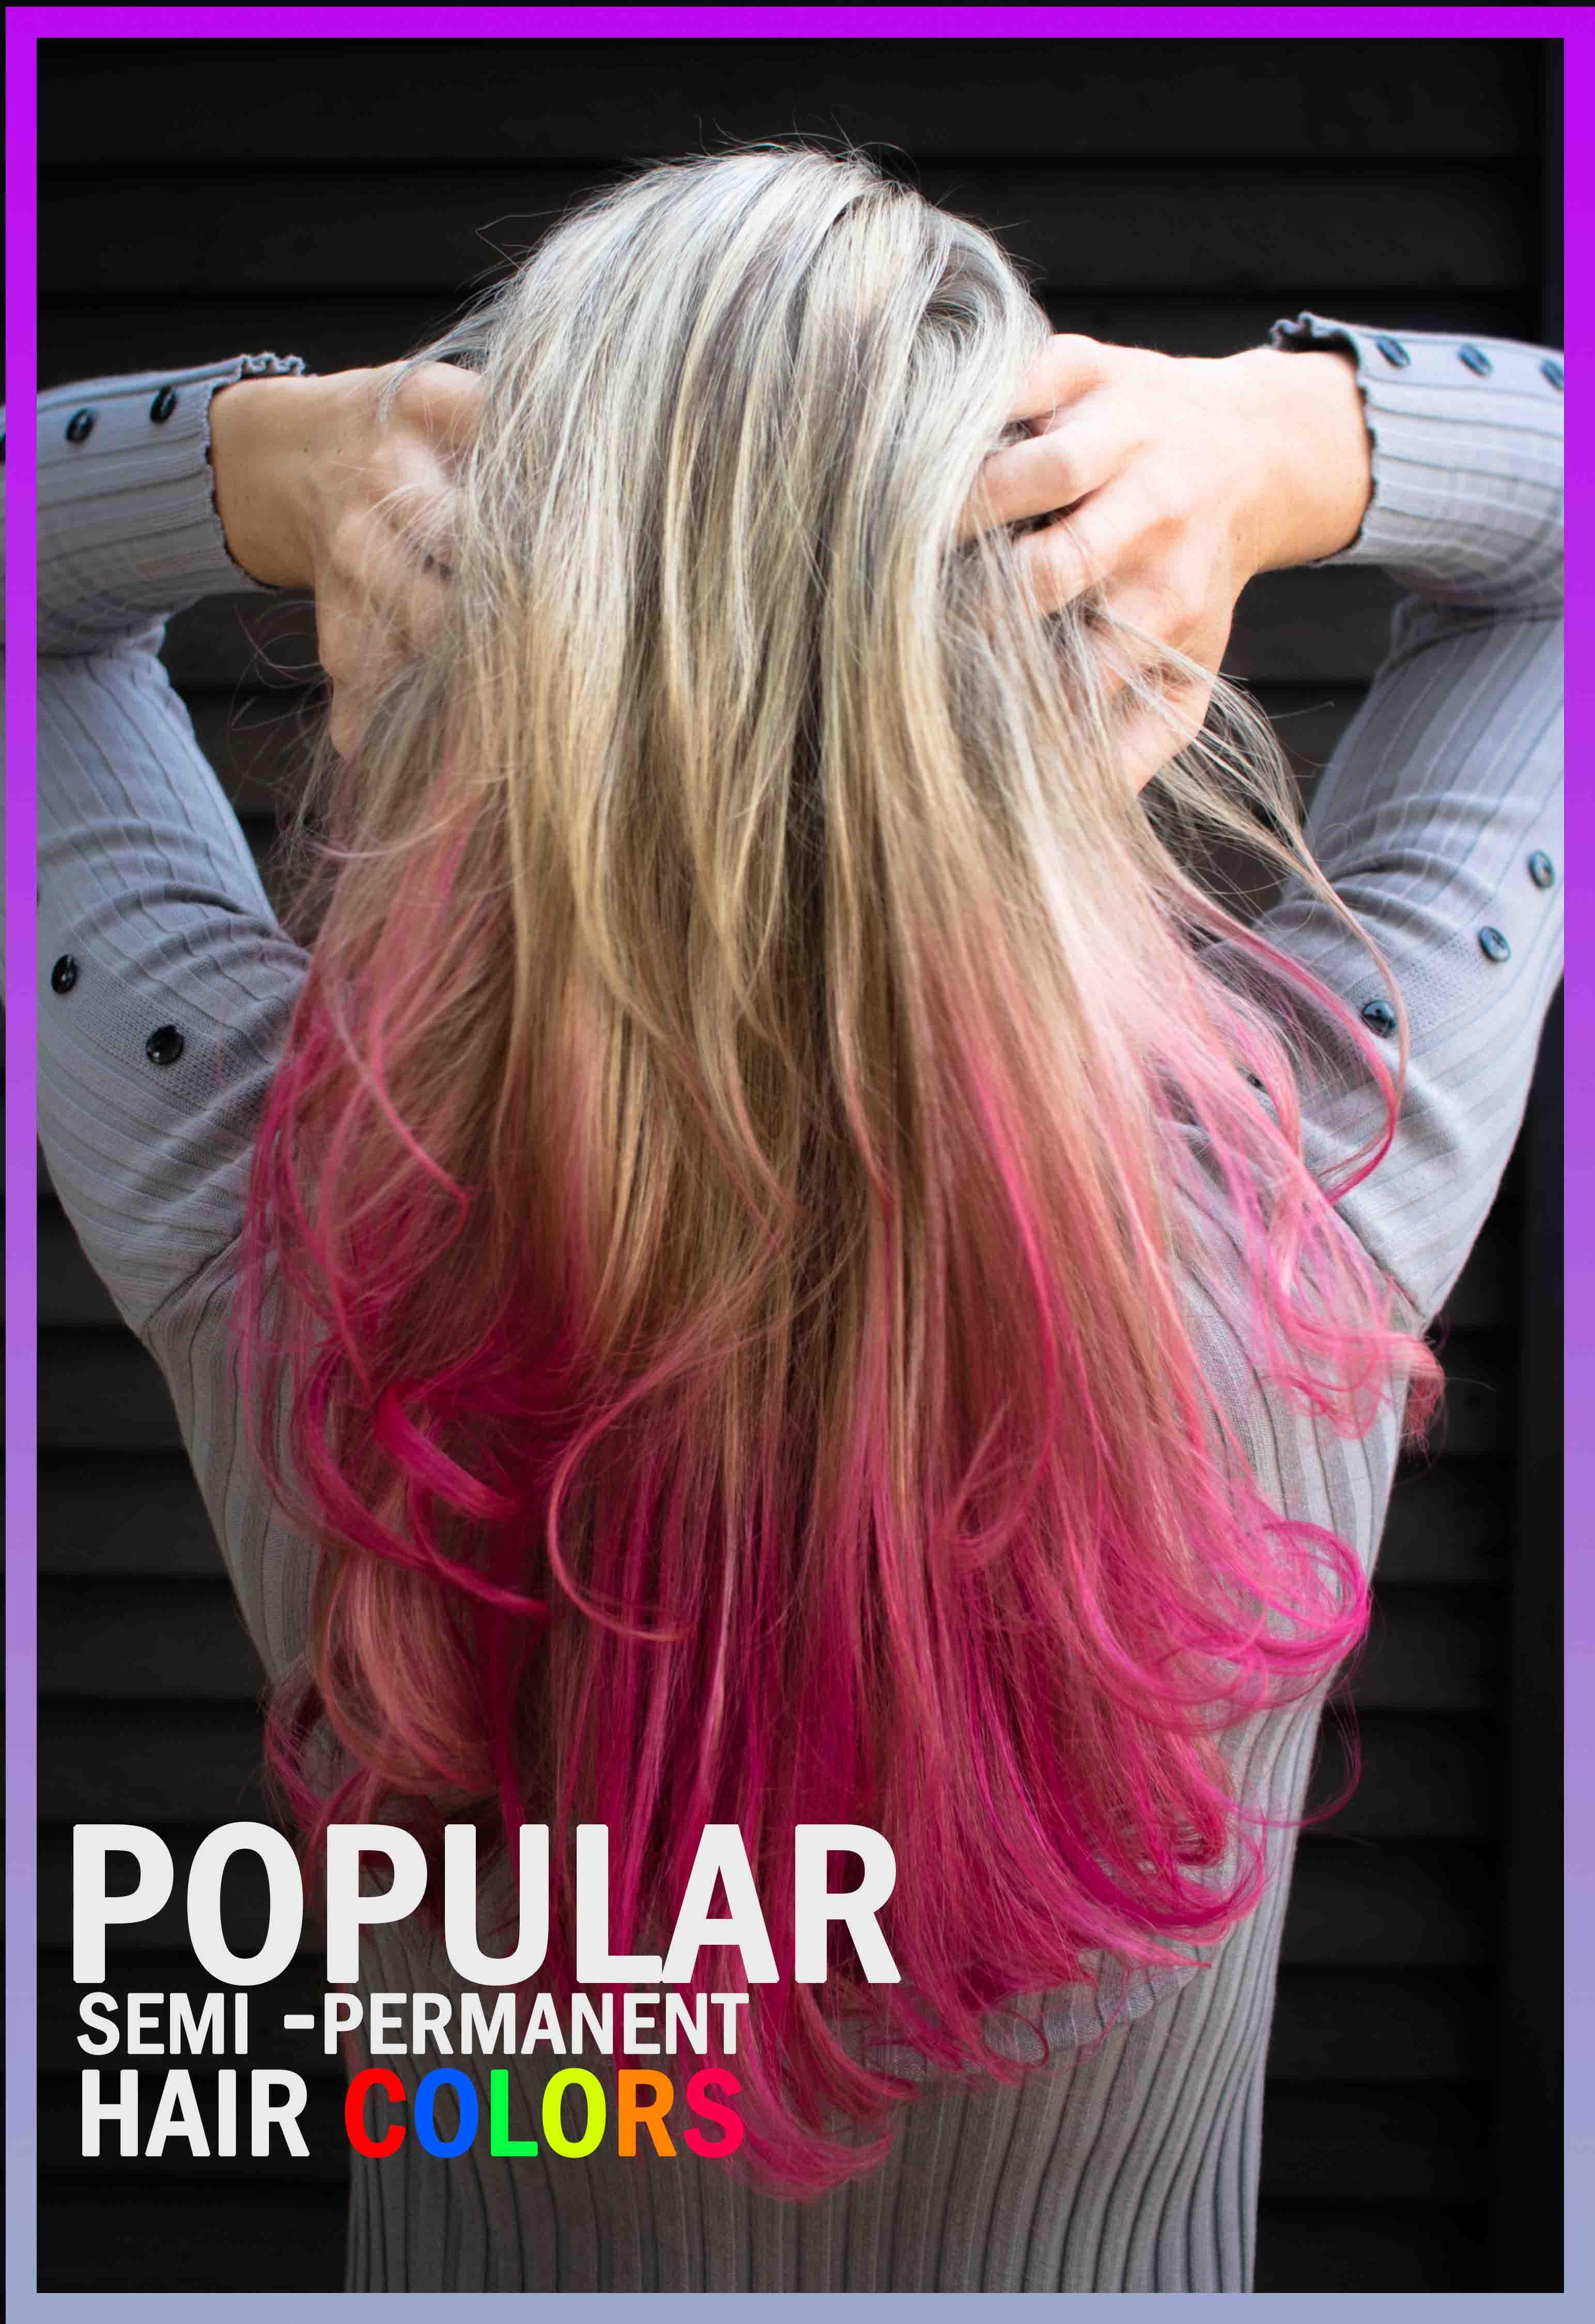 Popular semi permanent hair colors